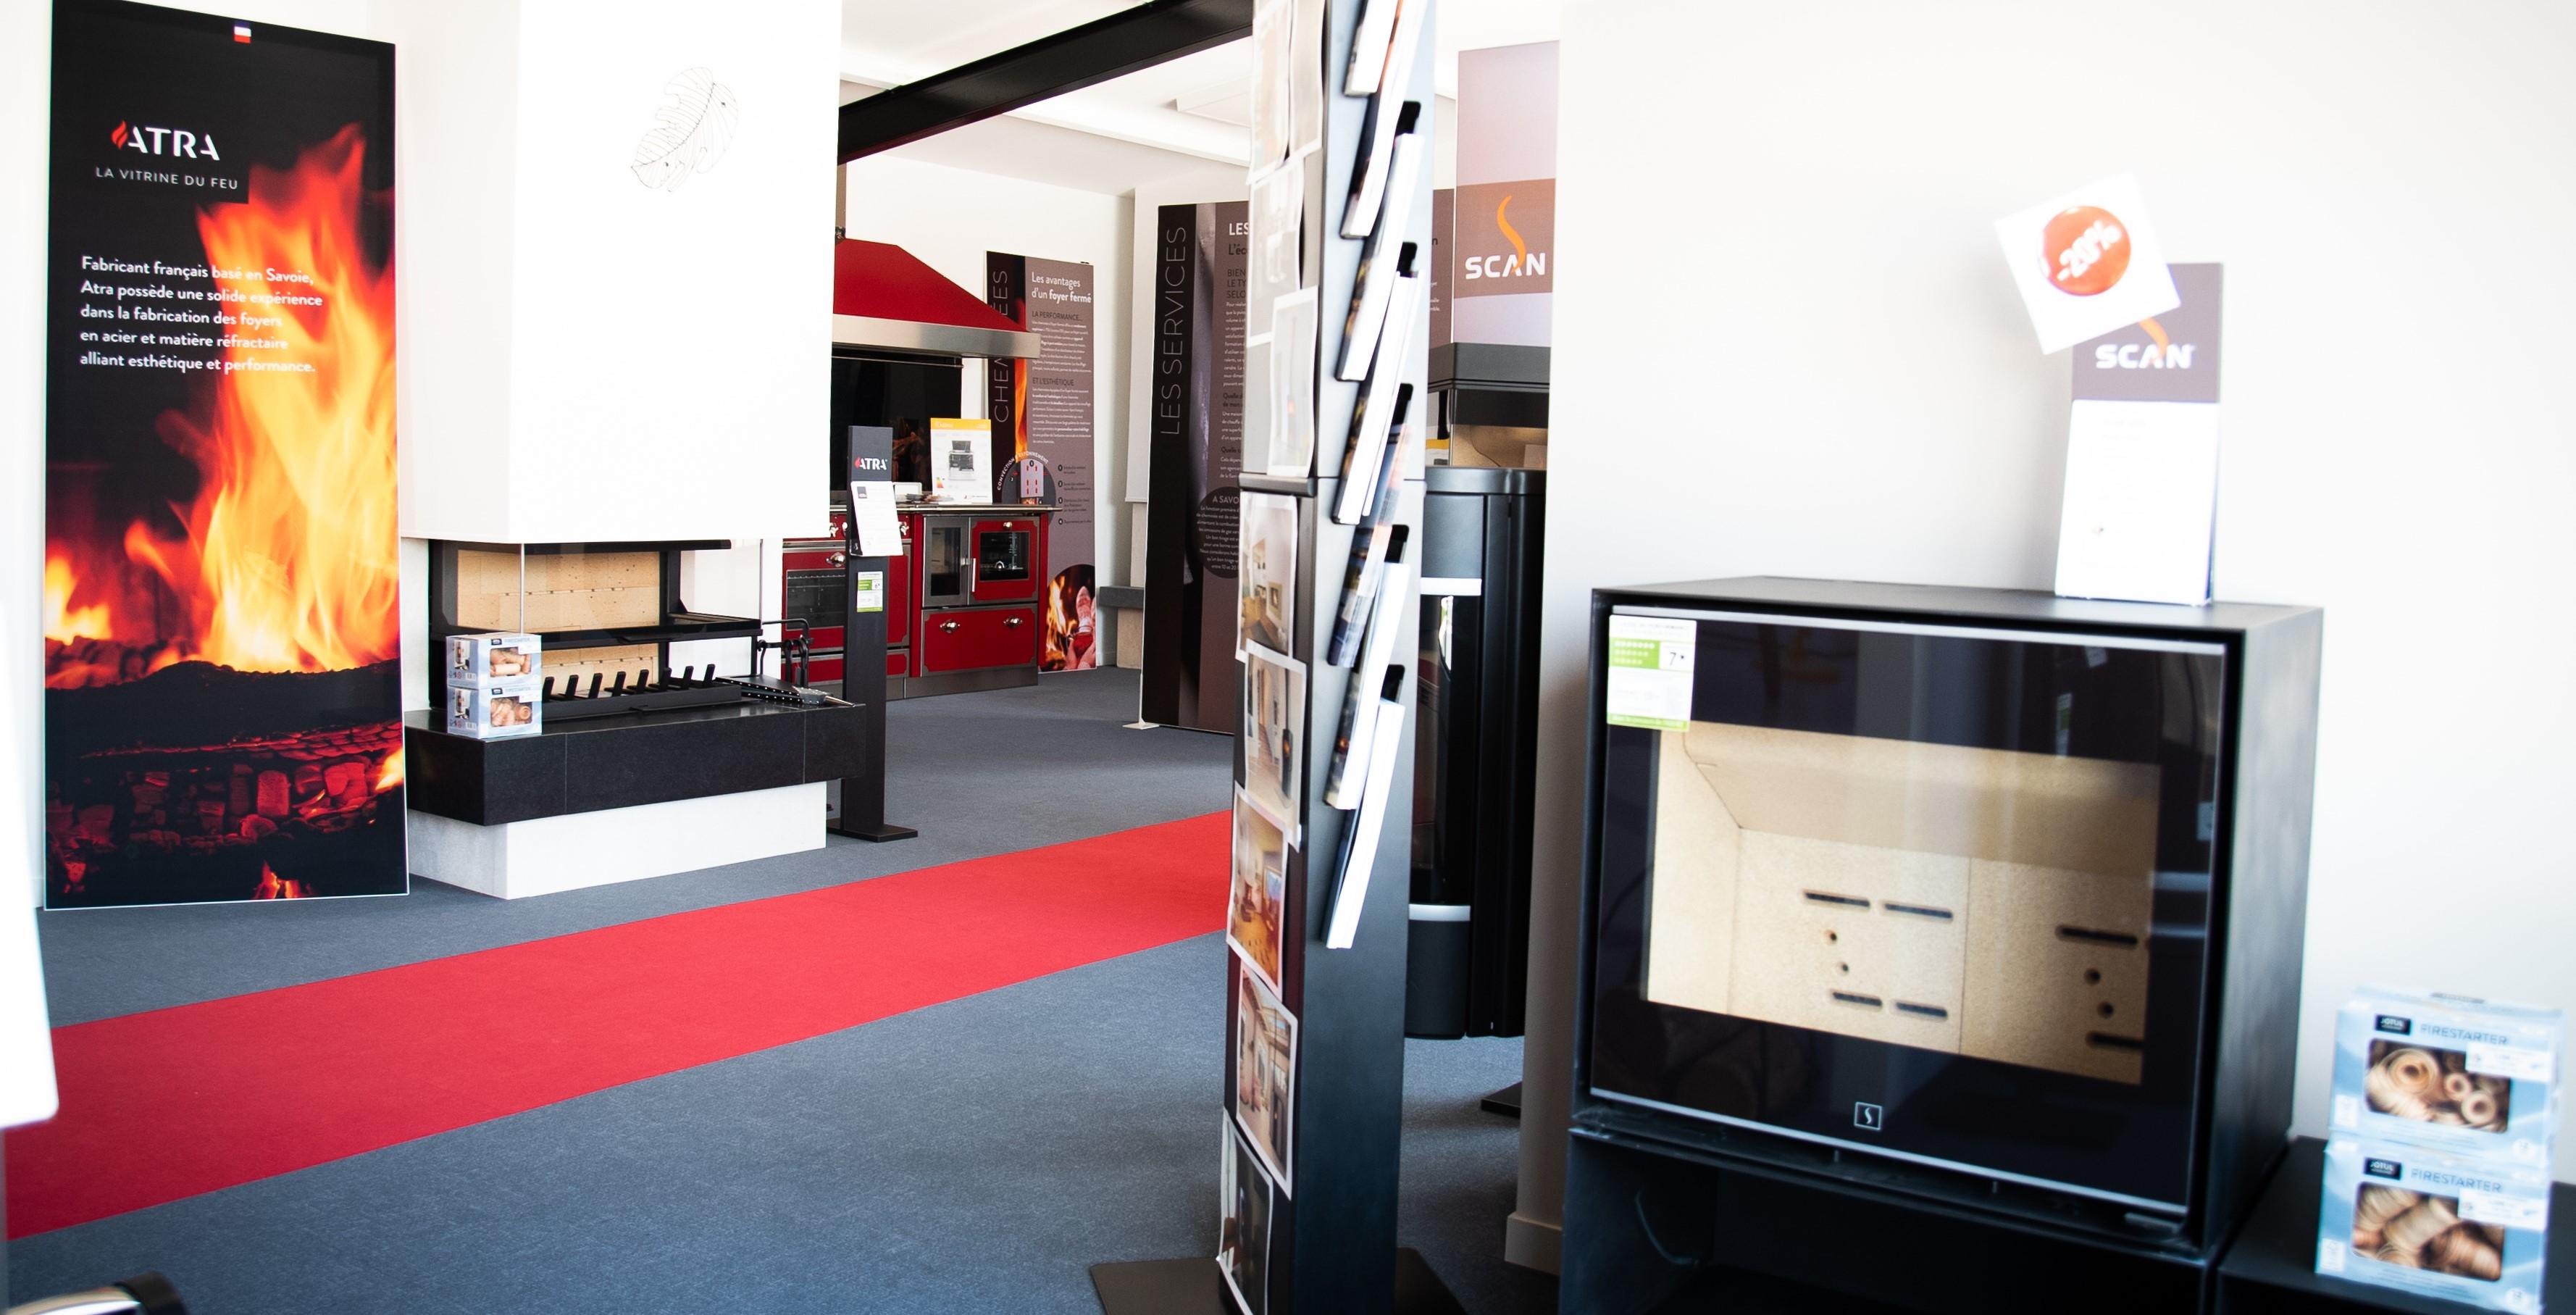 Showroom JOTUL Savigné, Giraud & Fils, poele à bois et cheminée sur mesure, SCAN, ATRA